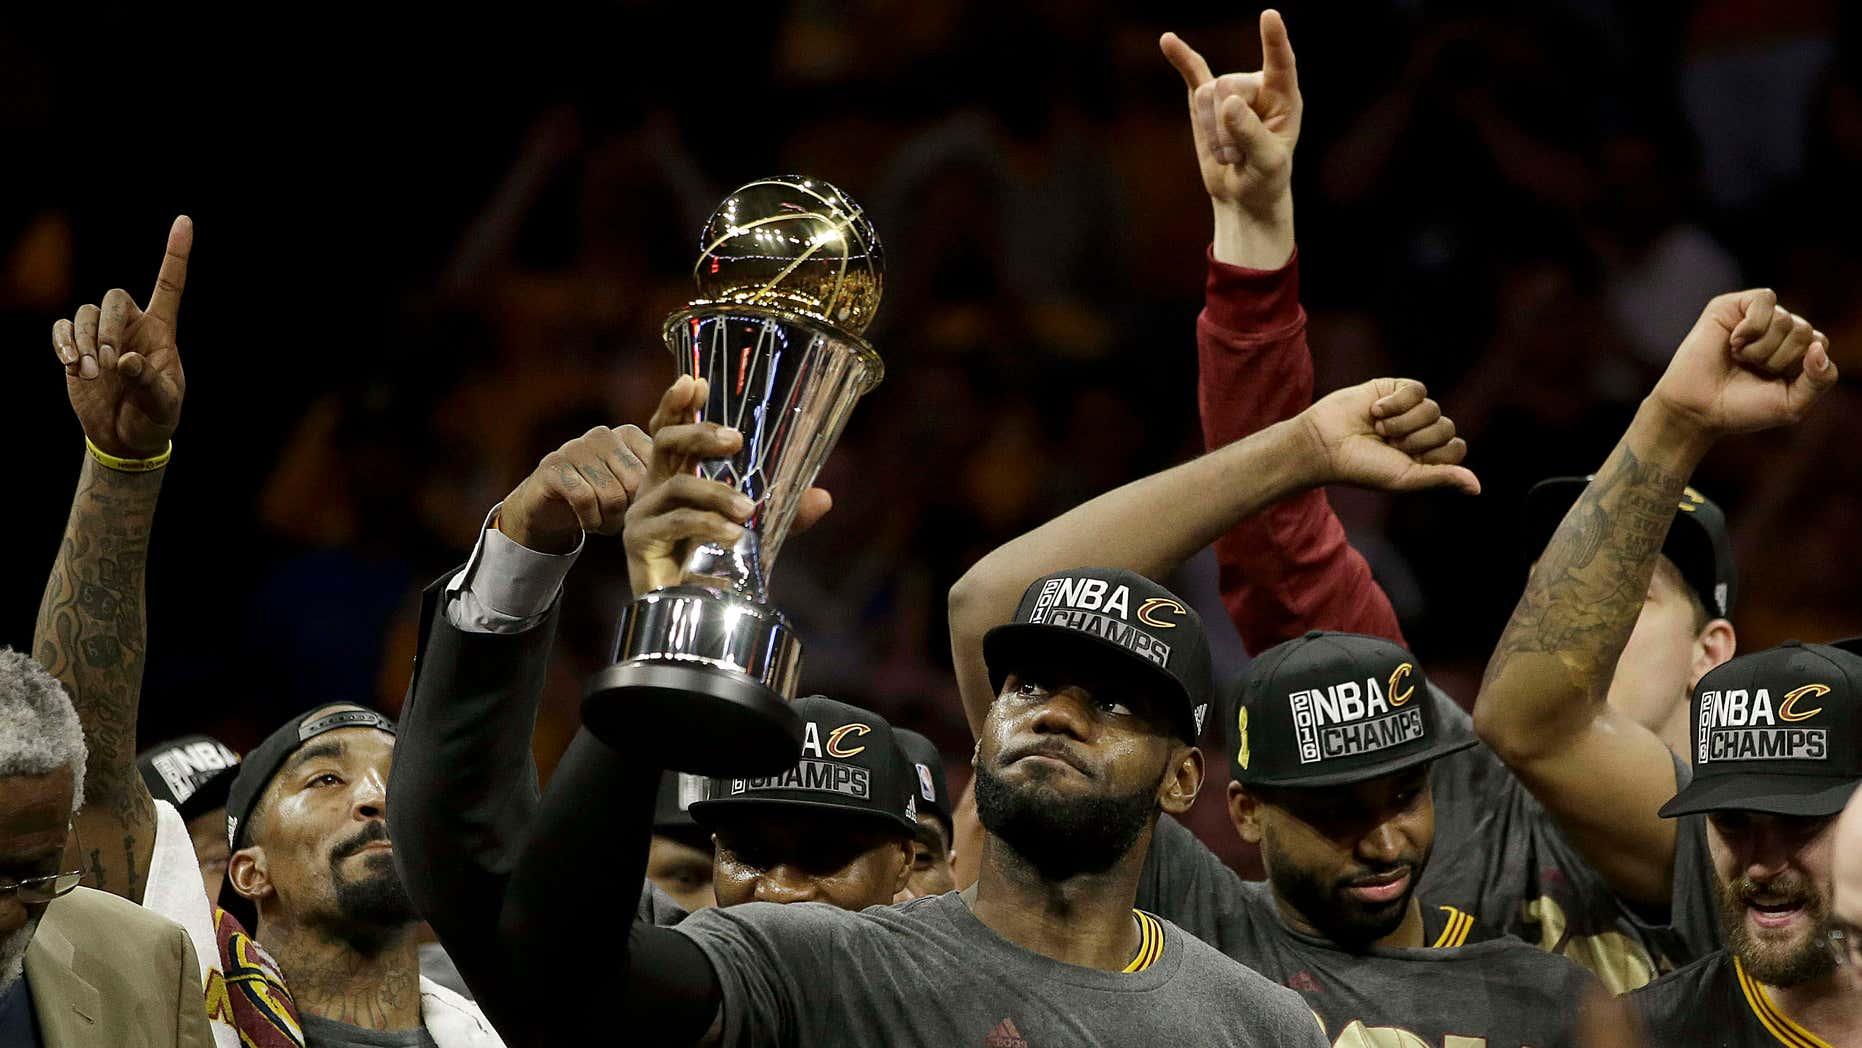 ee8f4f40ff5a LeBron James wins third NBA Finals MVP award